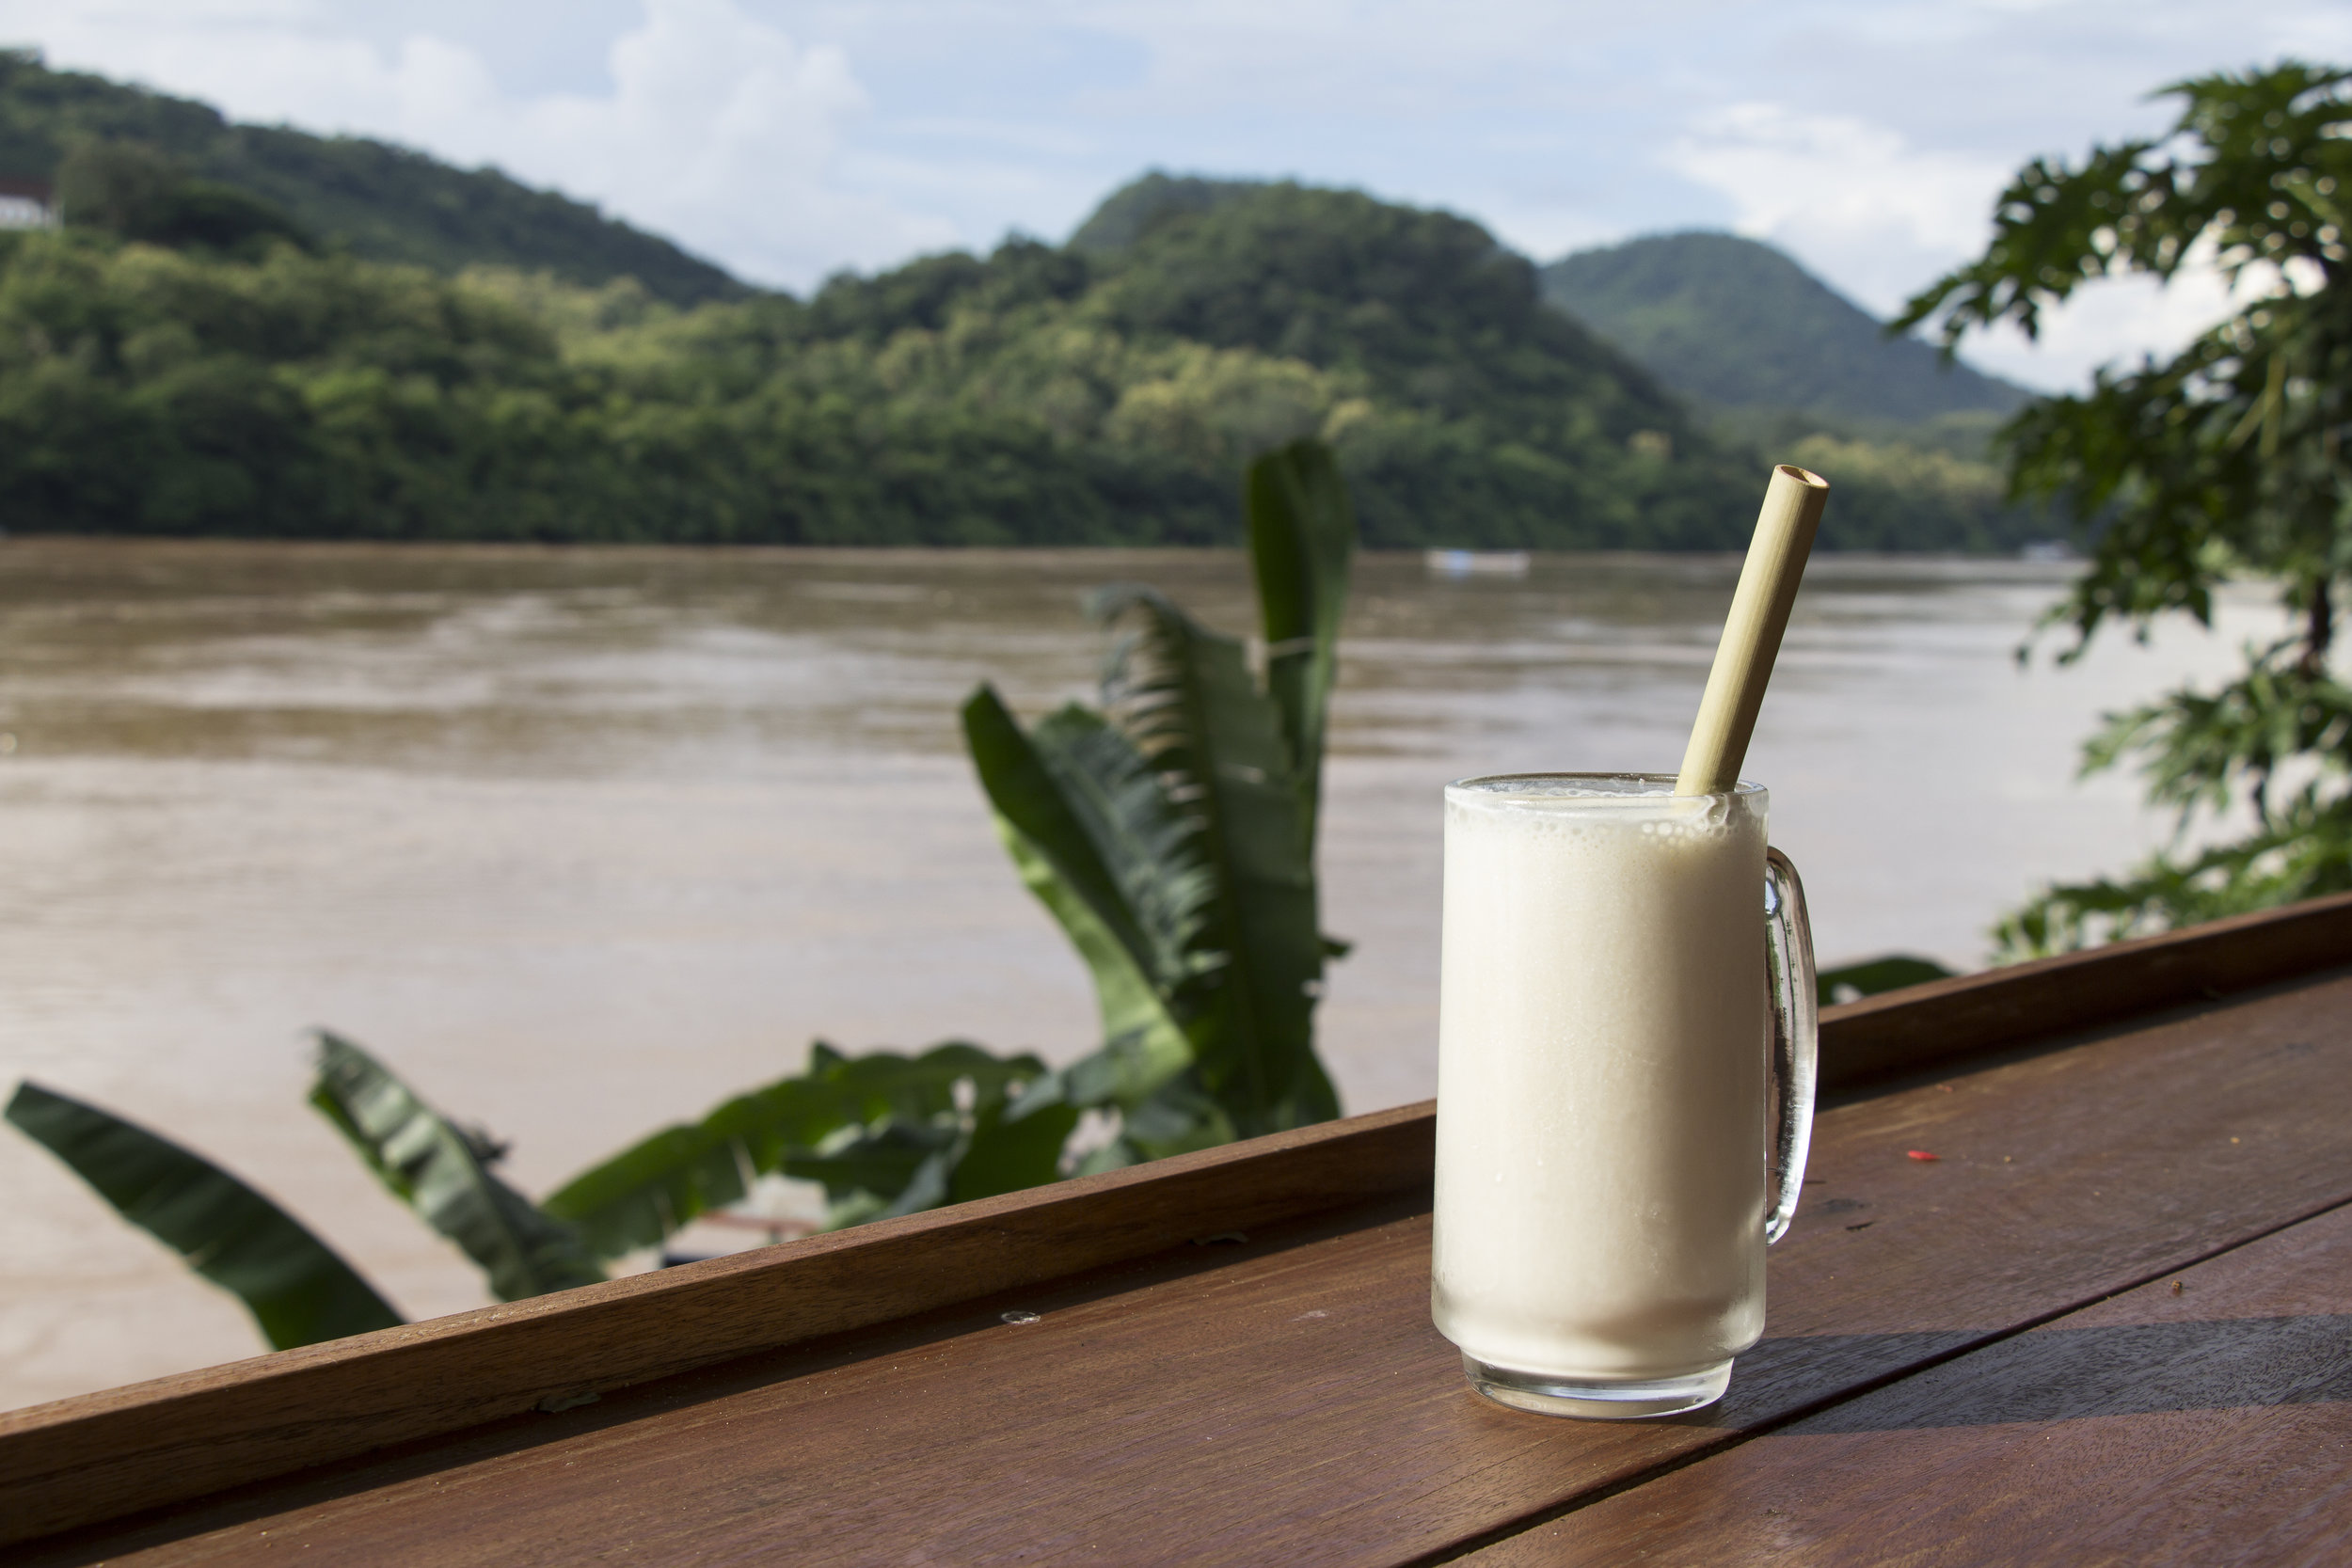 coconut straw drink.jpg